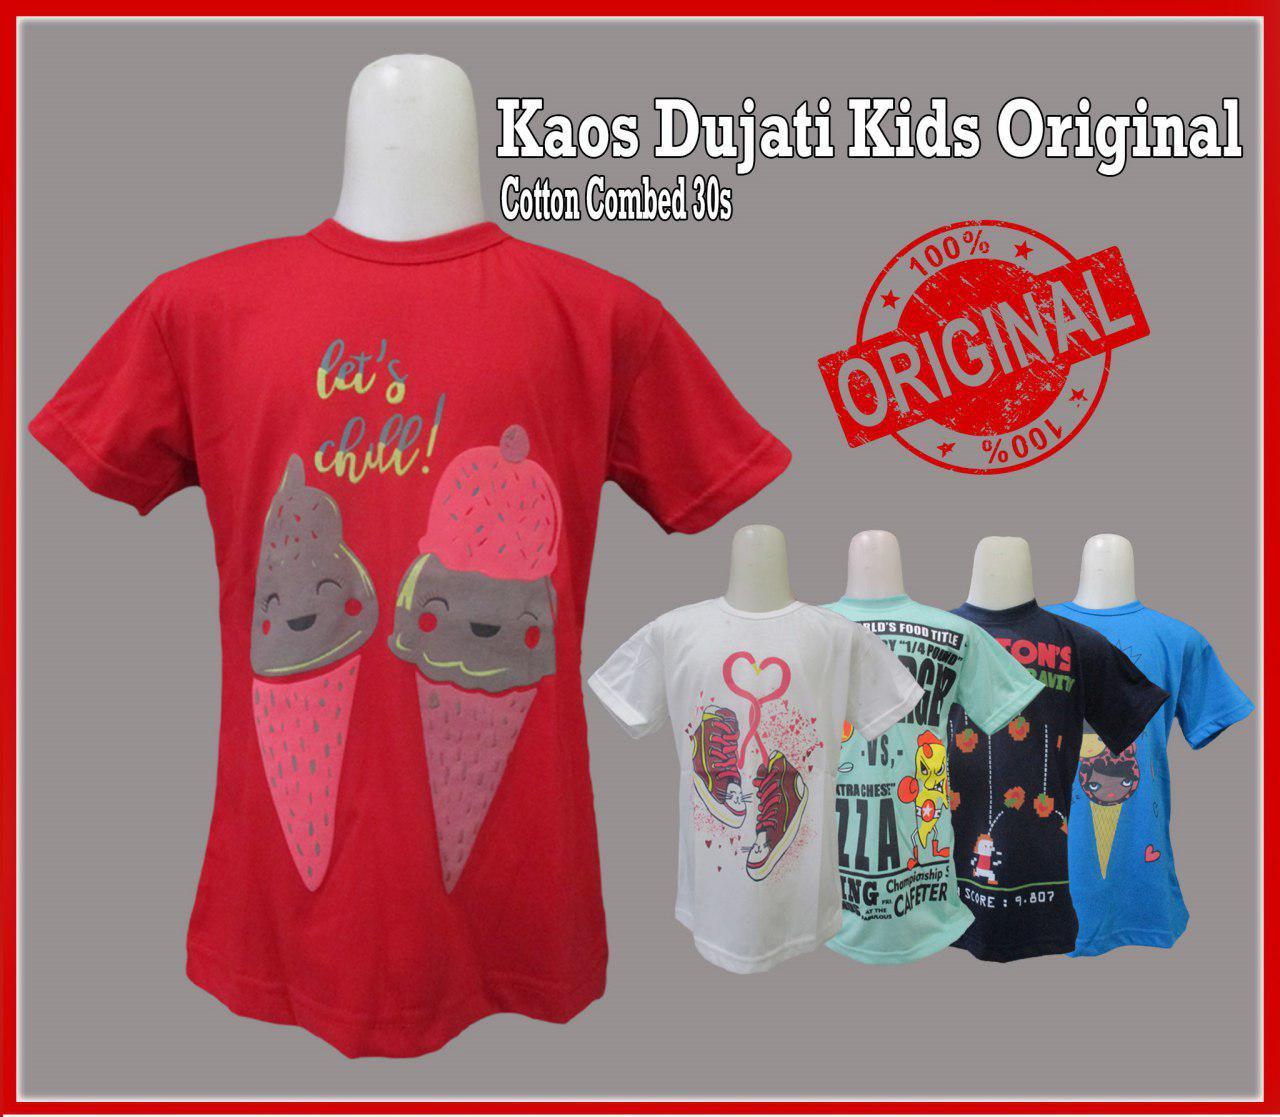 Pusat Grosir Baju Murah Solo Klewer 2021 Pusat Grosir Kaos Dujati Kids Ori Murah 20ribuan